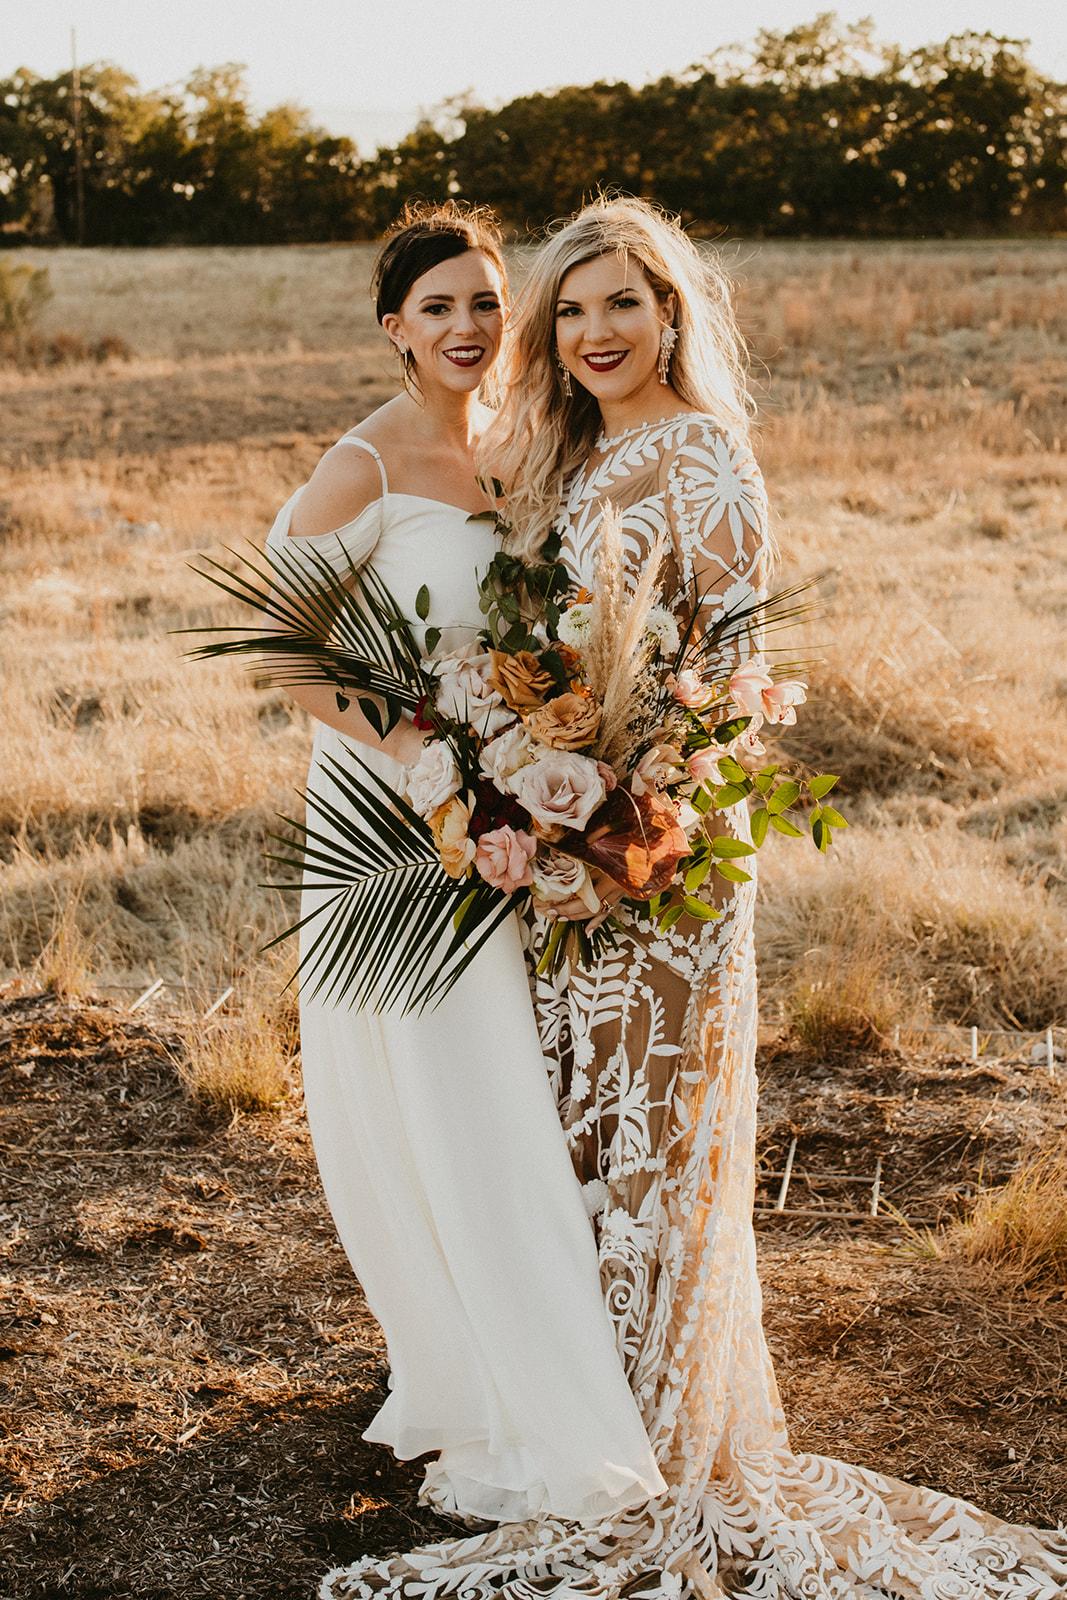 Tropical Colorful Frond Bridesmaid + Bride Bouquets + White Creamy Bridesmaid Dresses + Rue De Seine Wedding Dress + Boho Wedding + Wedding Coordinator Epoch Co+